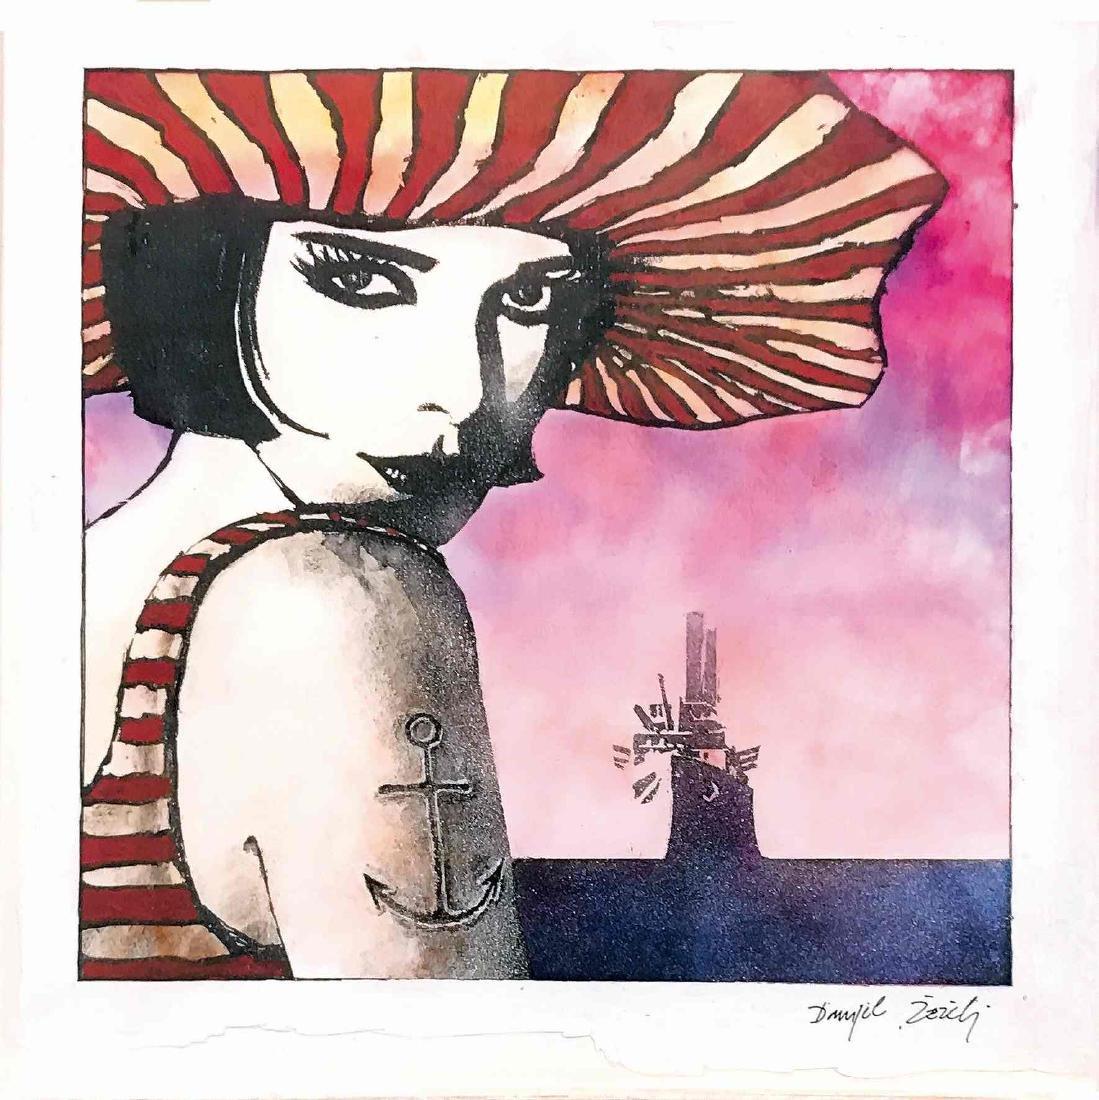 DANIJEL ZEZELJ  -  Cover per Il Grifo